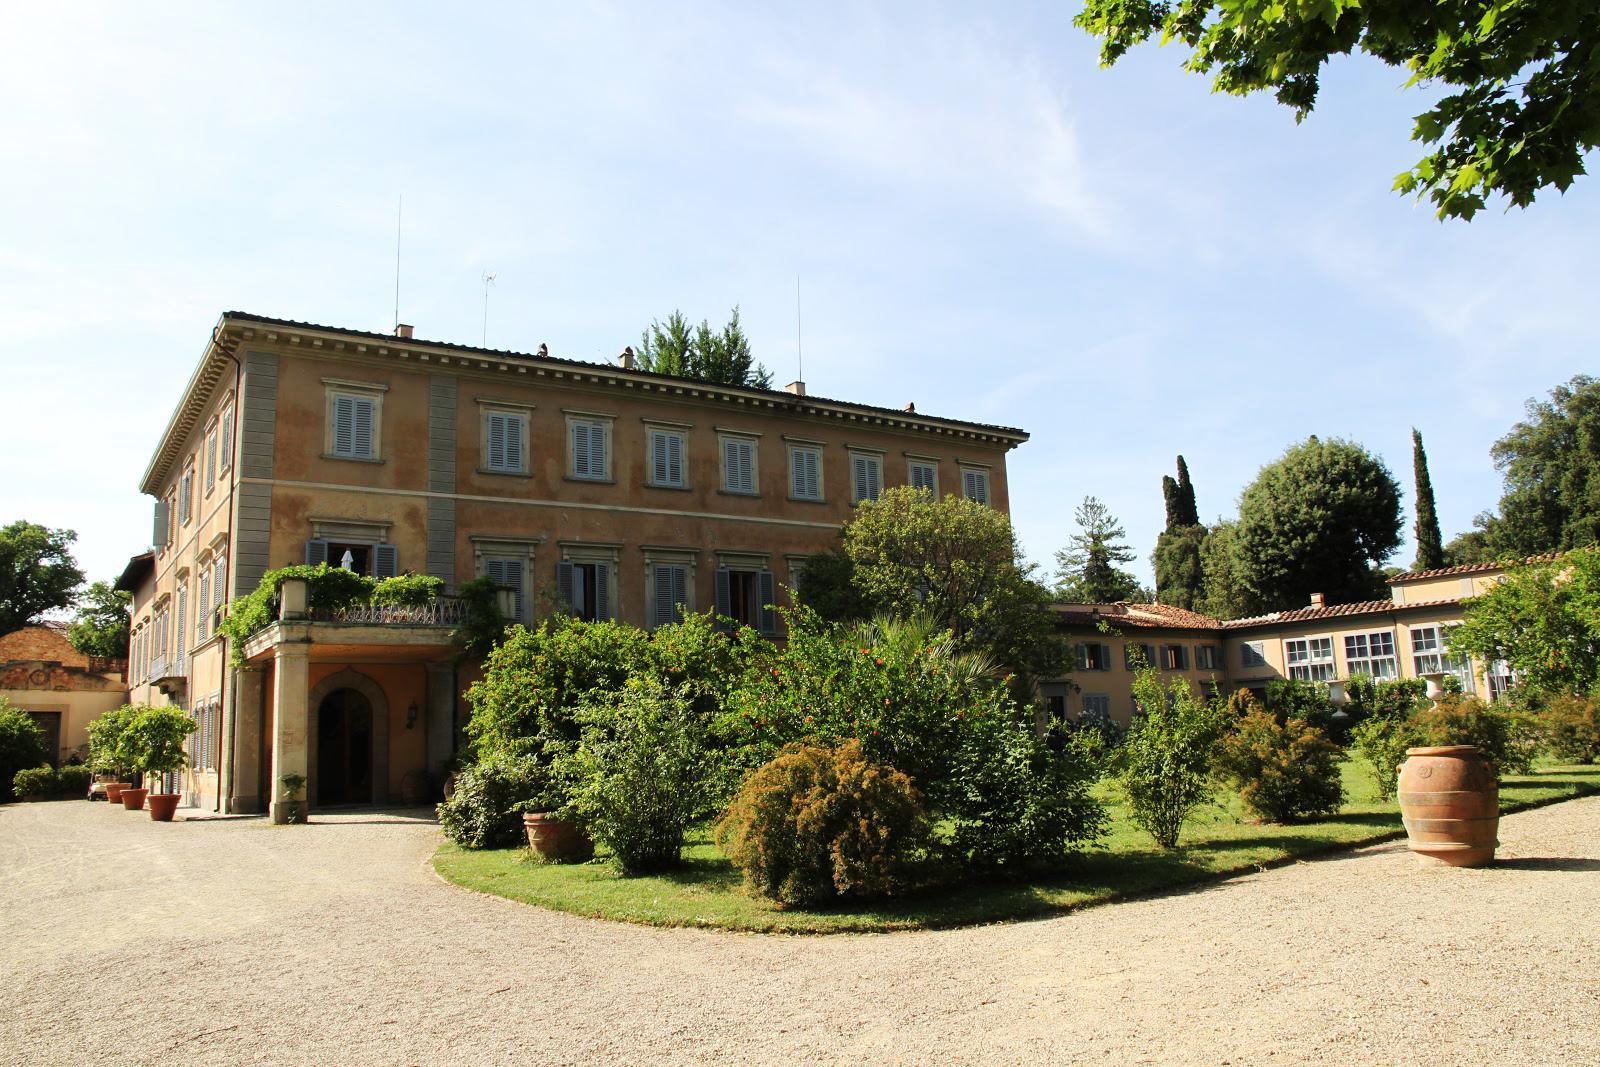 Cortili e giardini aperti a firenze e in toscana firenze for Giardino torrigiani